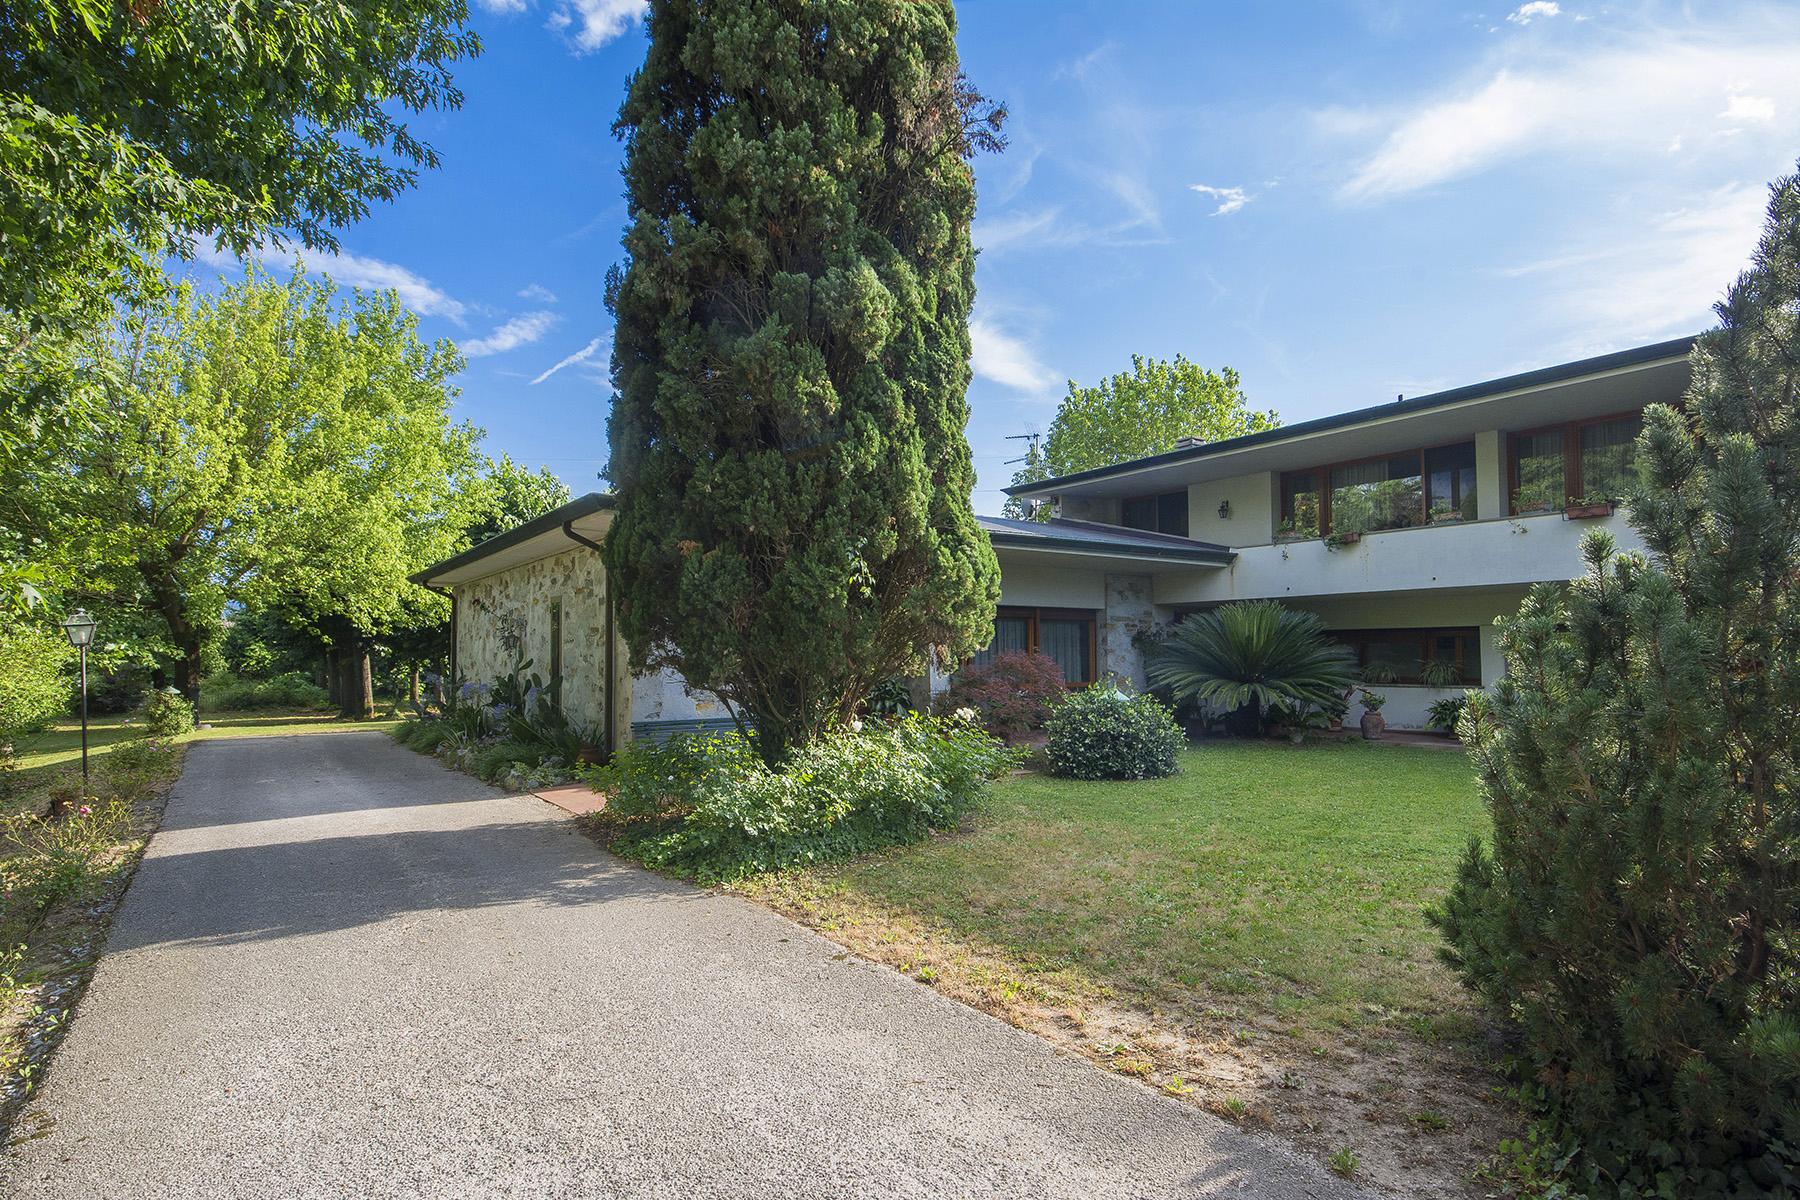 Villa in Vendita a Capannori: 5 locali, 500 mq - Foto 3